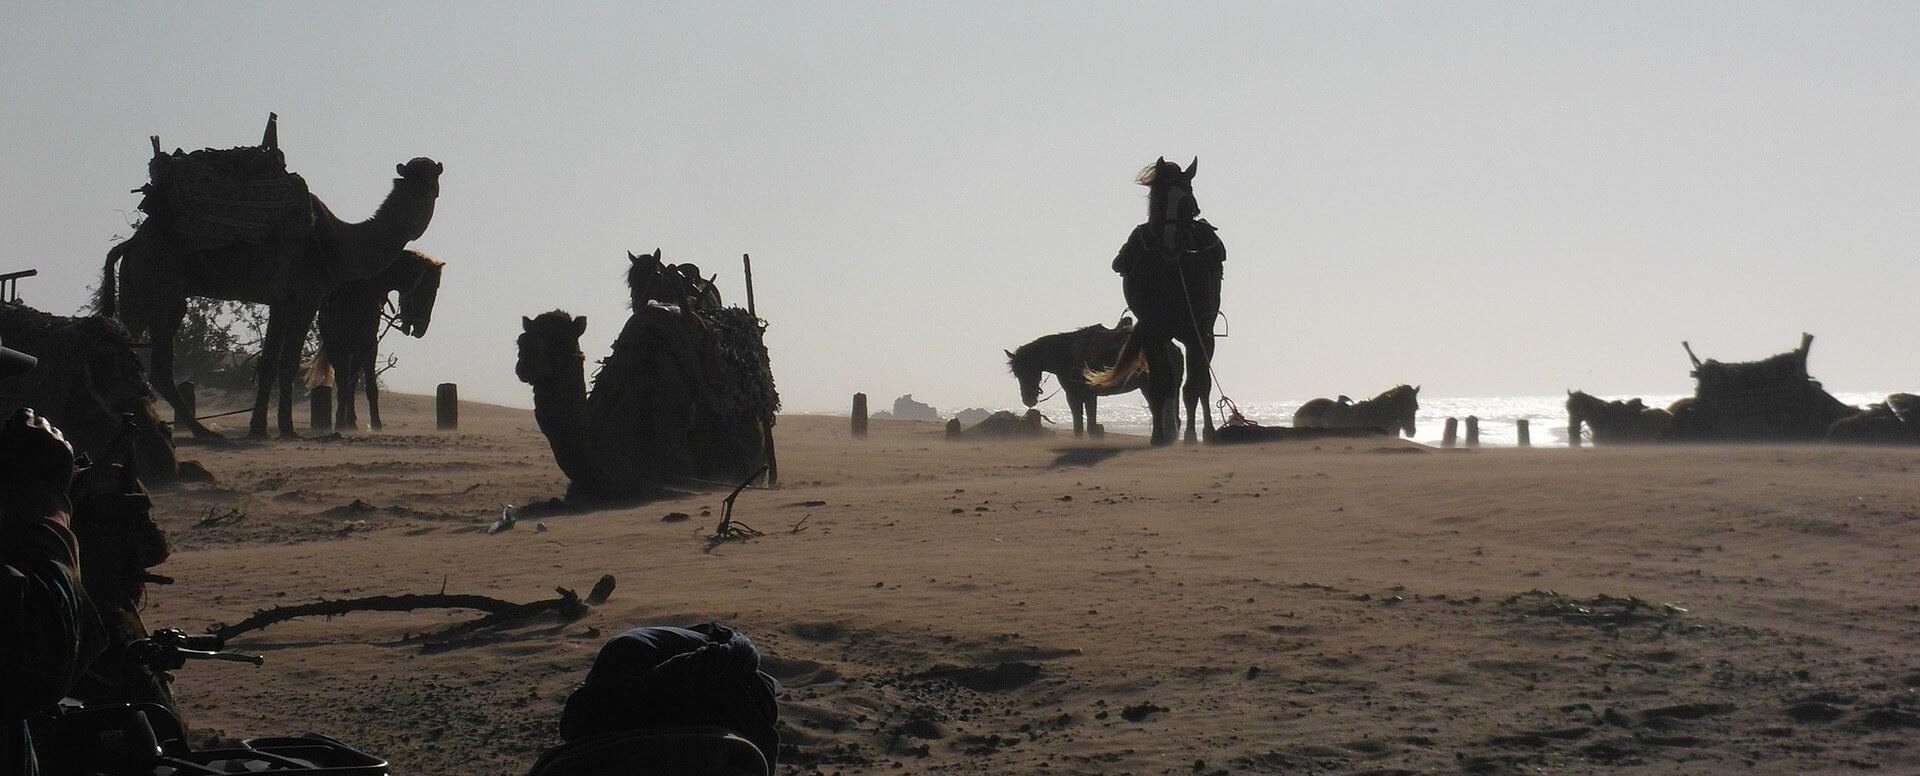 Un large choix d'activités en plein air - Essaouira